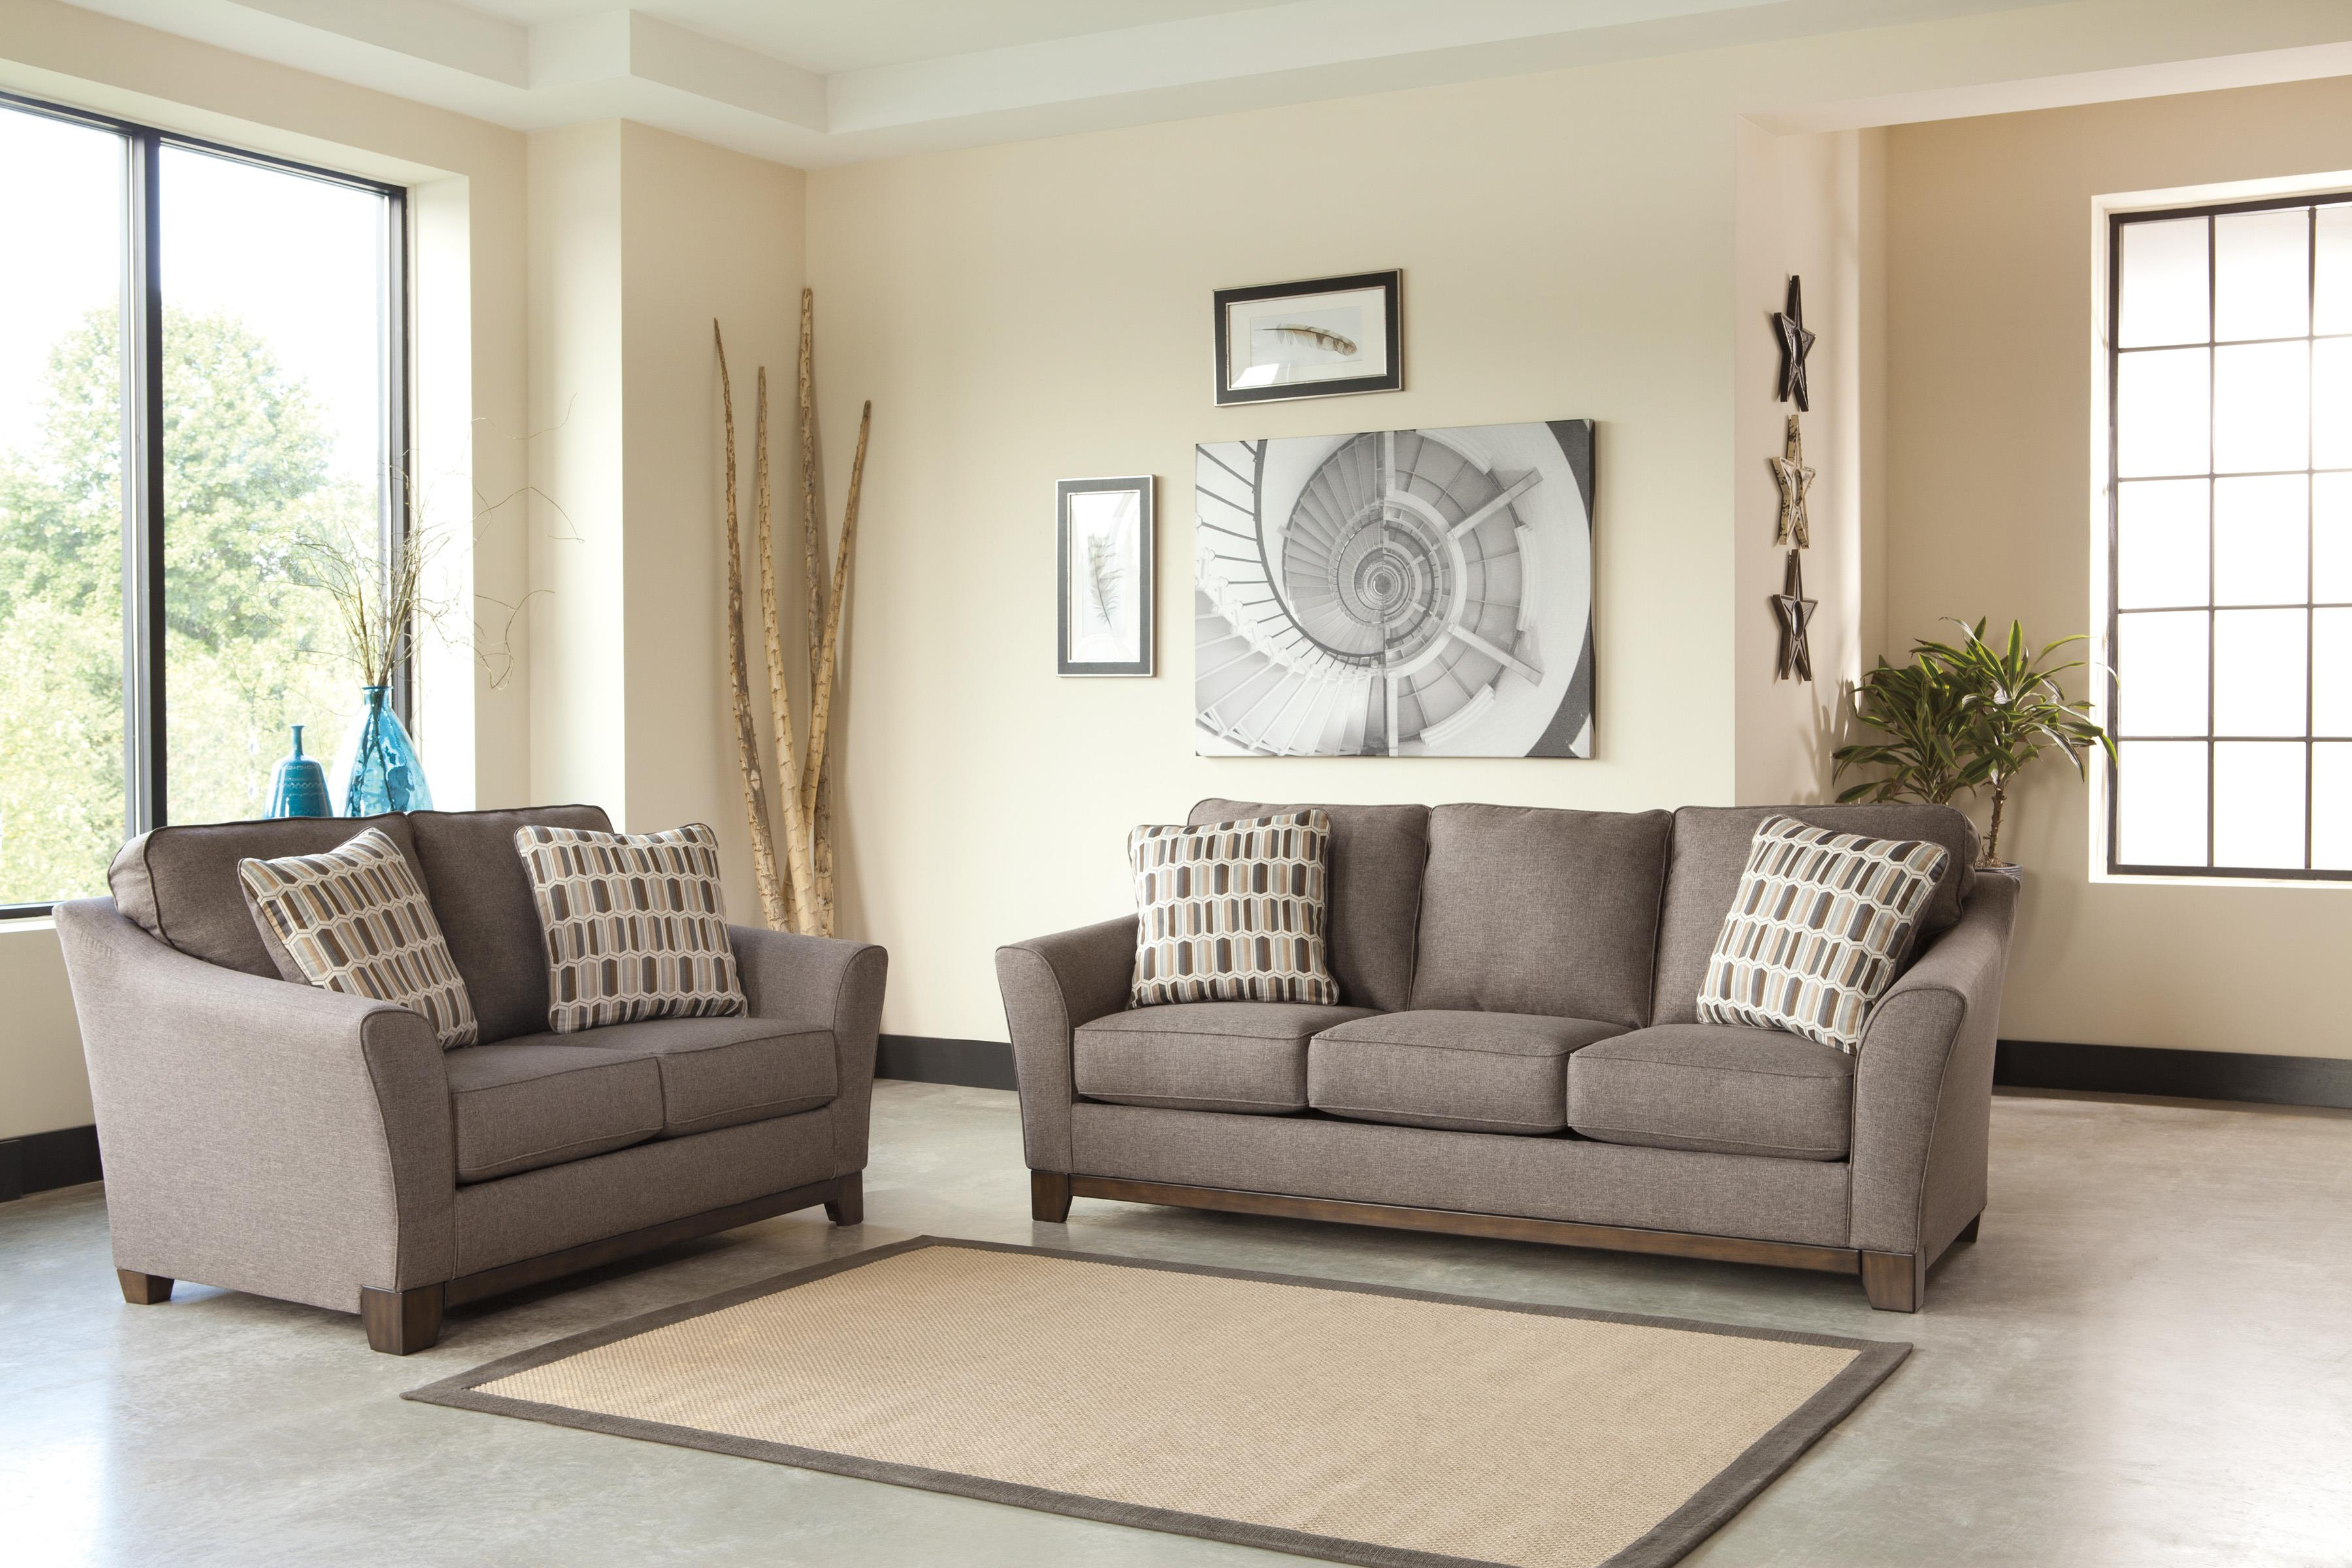 Benchcraft Janley Stationary Living Room Group - Item Number: 43804 Living Room Group 1